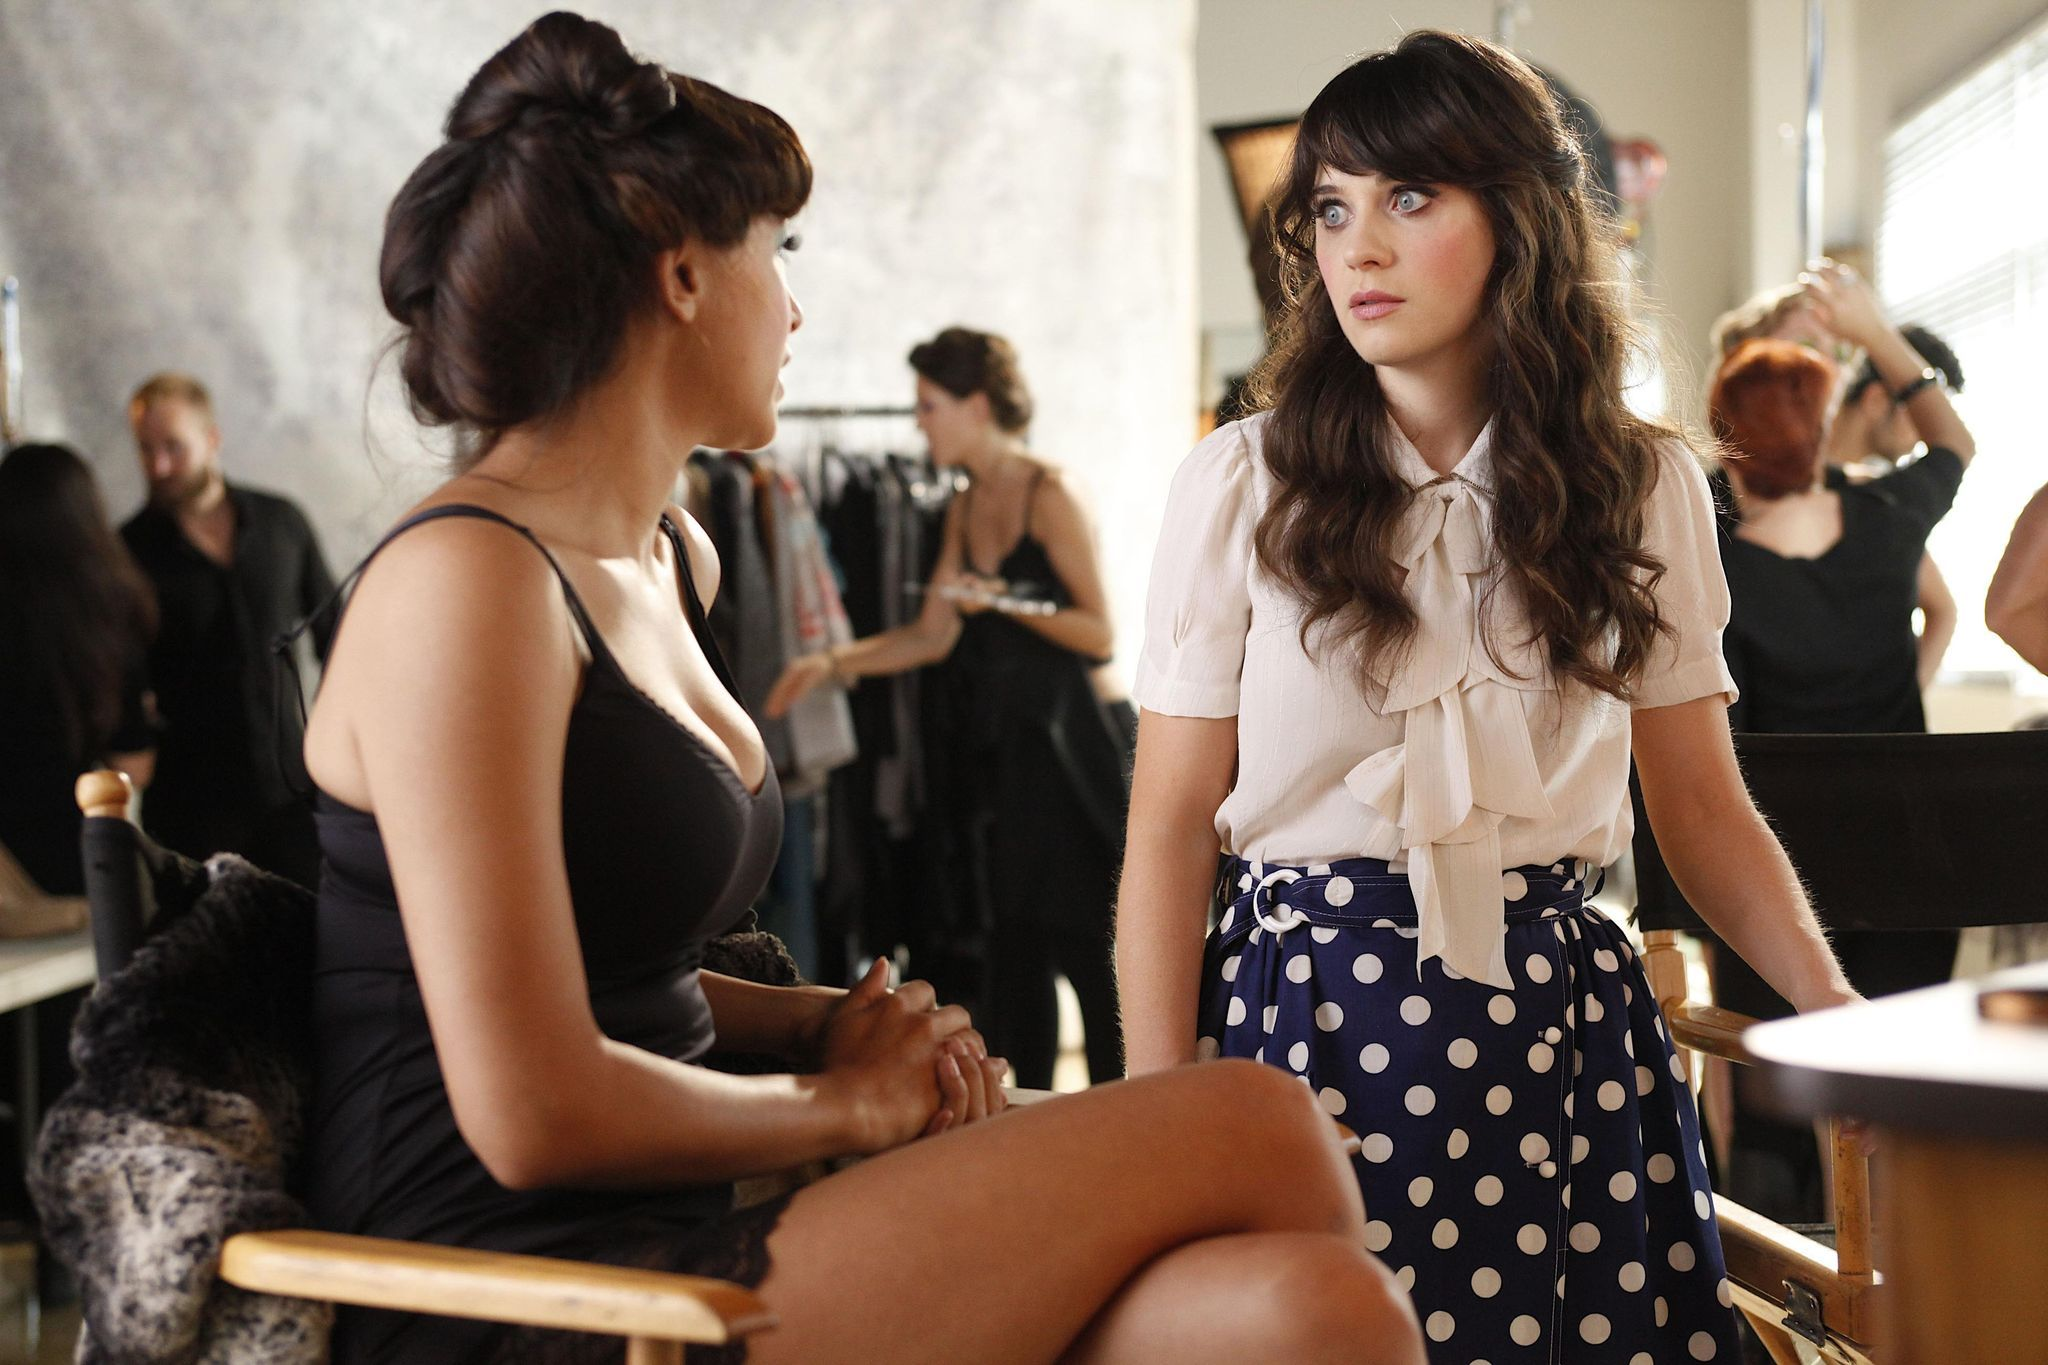 Cece (Hannah Simone), Jess (Zooey Deschanel) ~ New Girl Episode Stills ~ Season 1, Episode 4: Naked #amusementphile